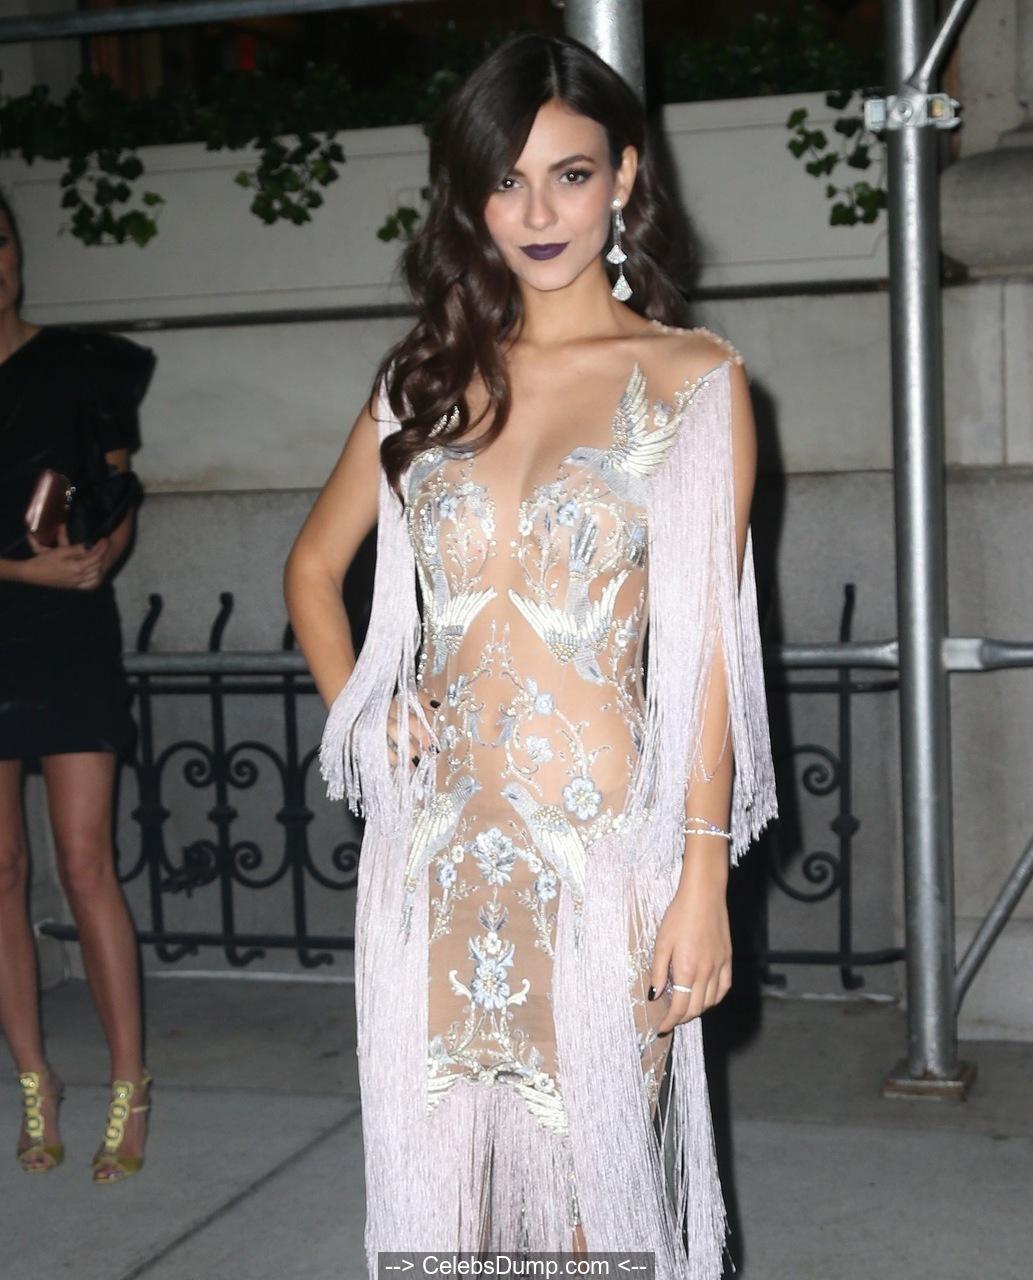 Sayesha saigal sexiest images amp photo galleryvanamagan actress hot stills